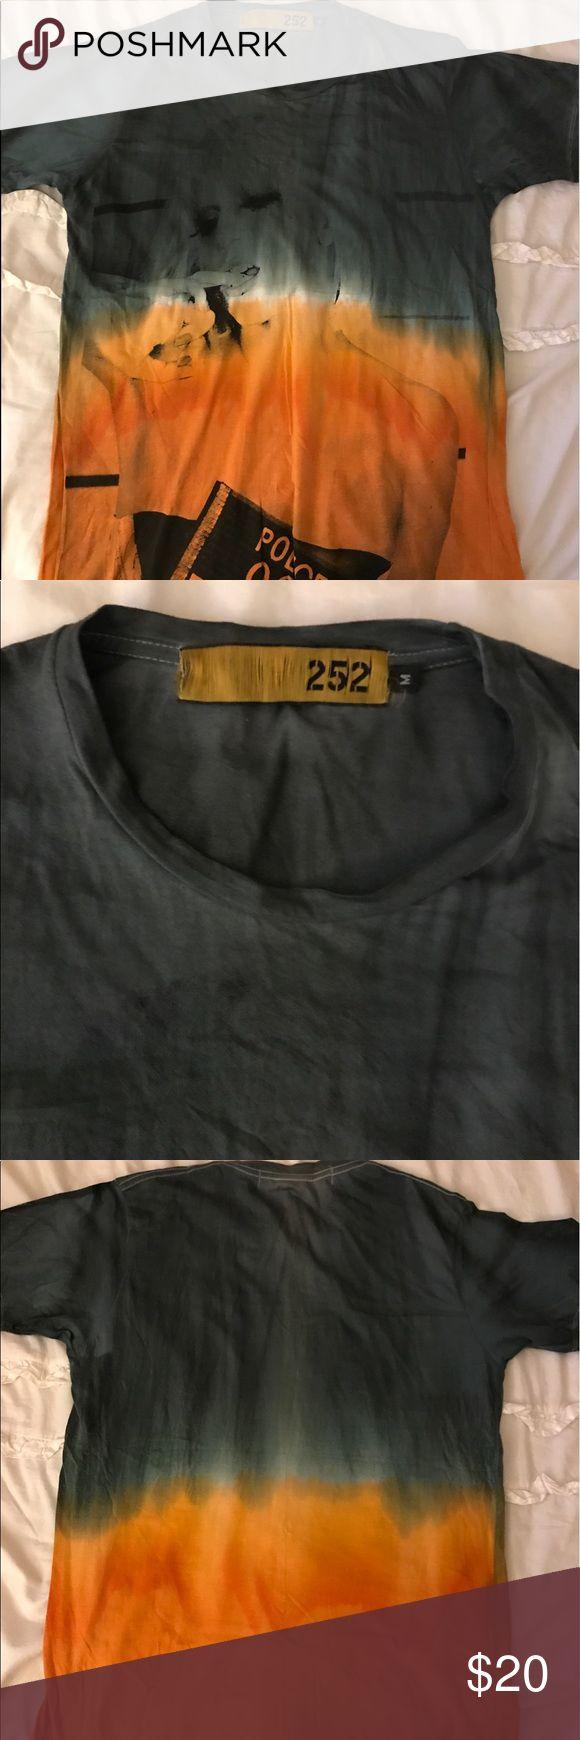 Lady Gaga T - Shirt Brand new. Never worn. Too small. Shirts Tees - Short Sleeve